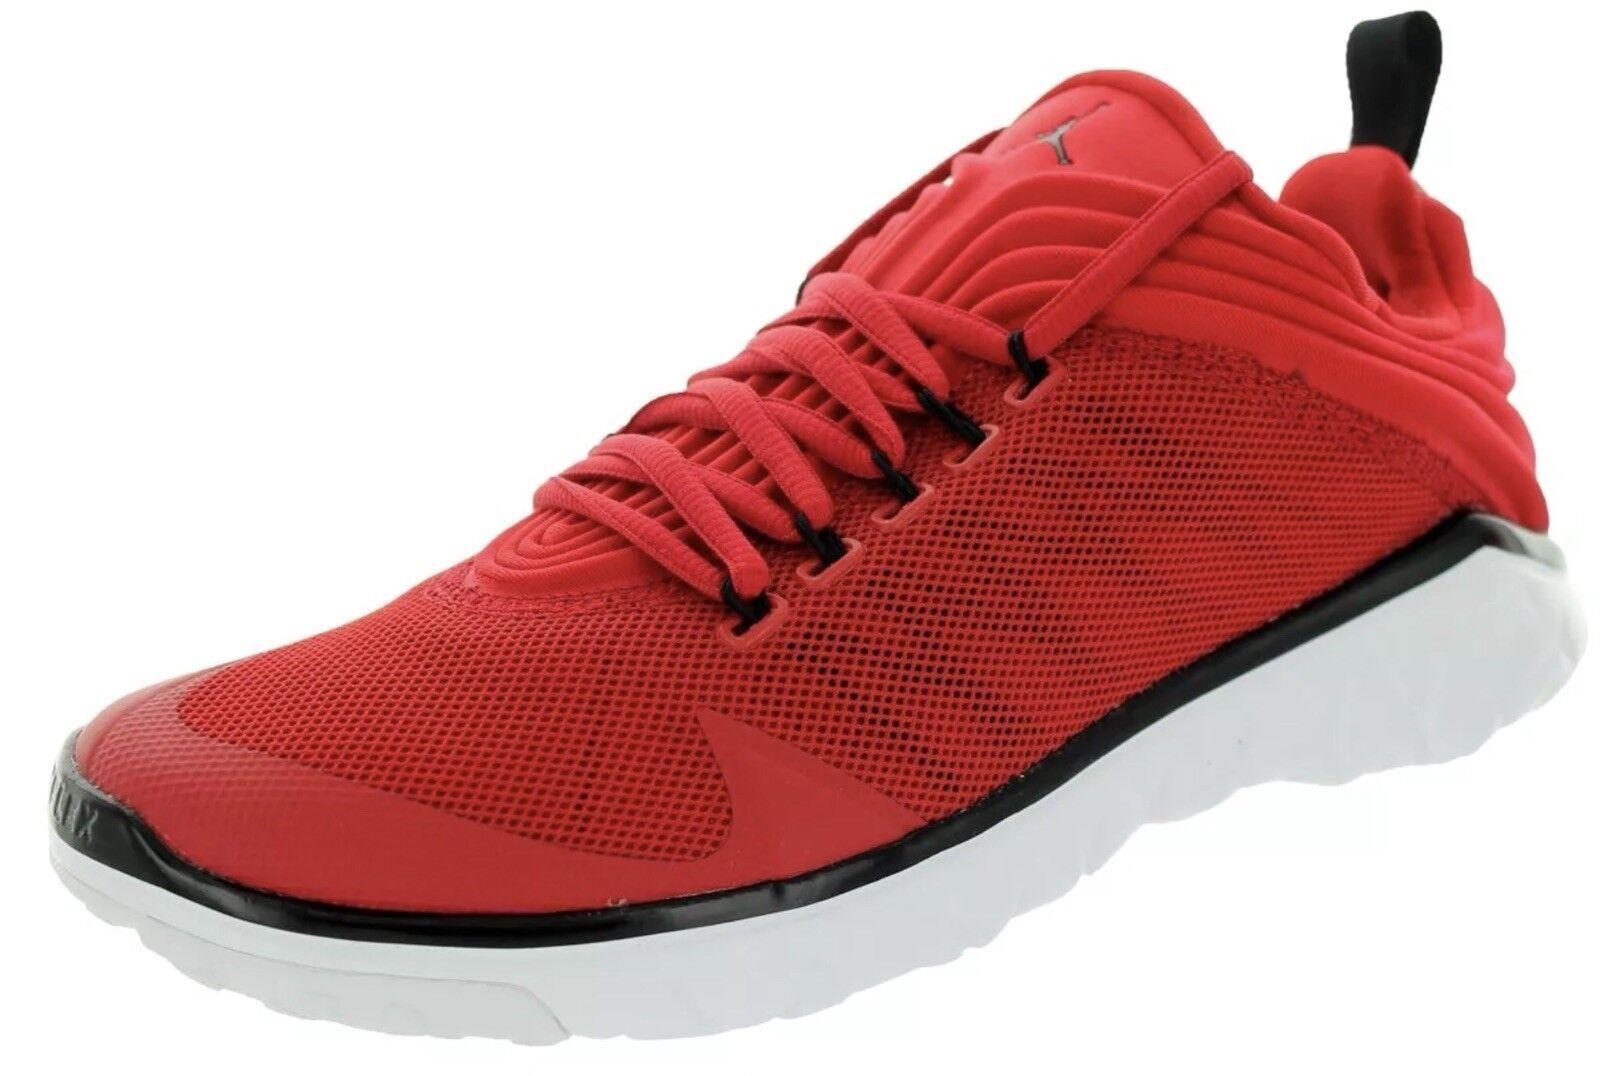 Men's/Women's Nike Jordan Flight Flex Trainer Gym Gym Gym durability discount price various kinds 7ae629